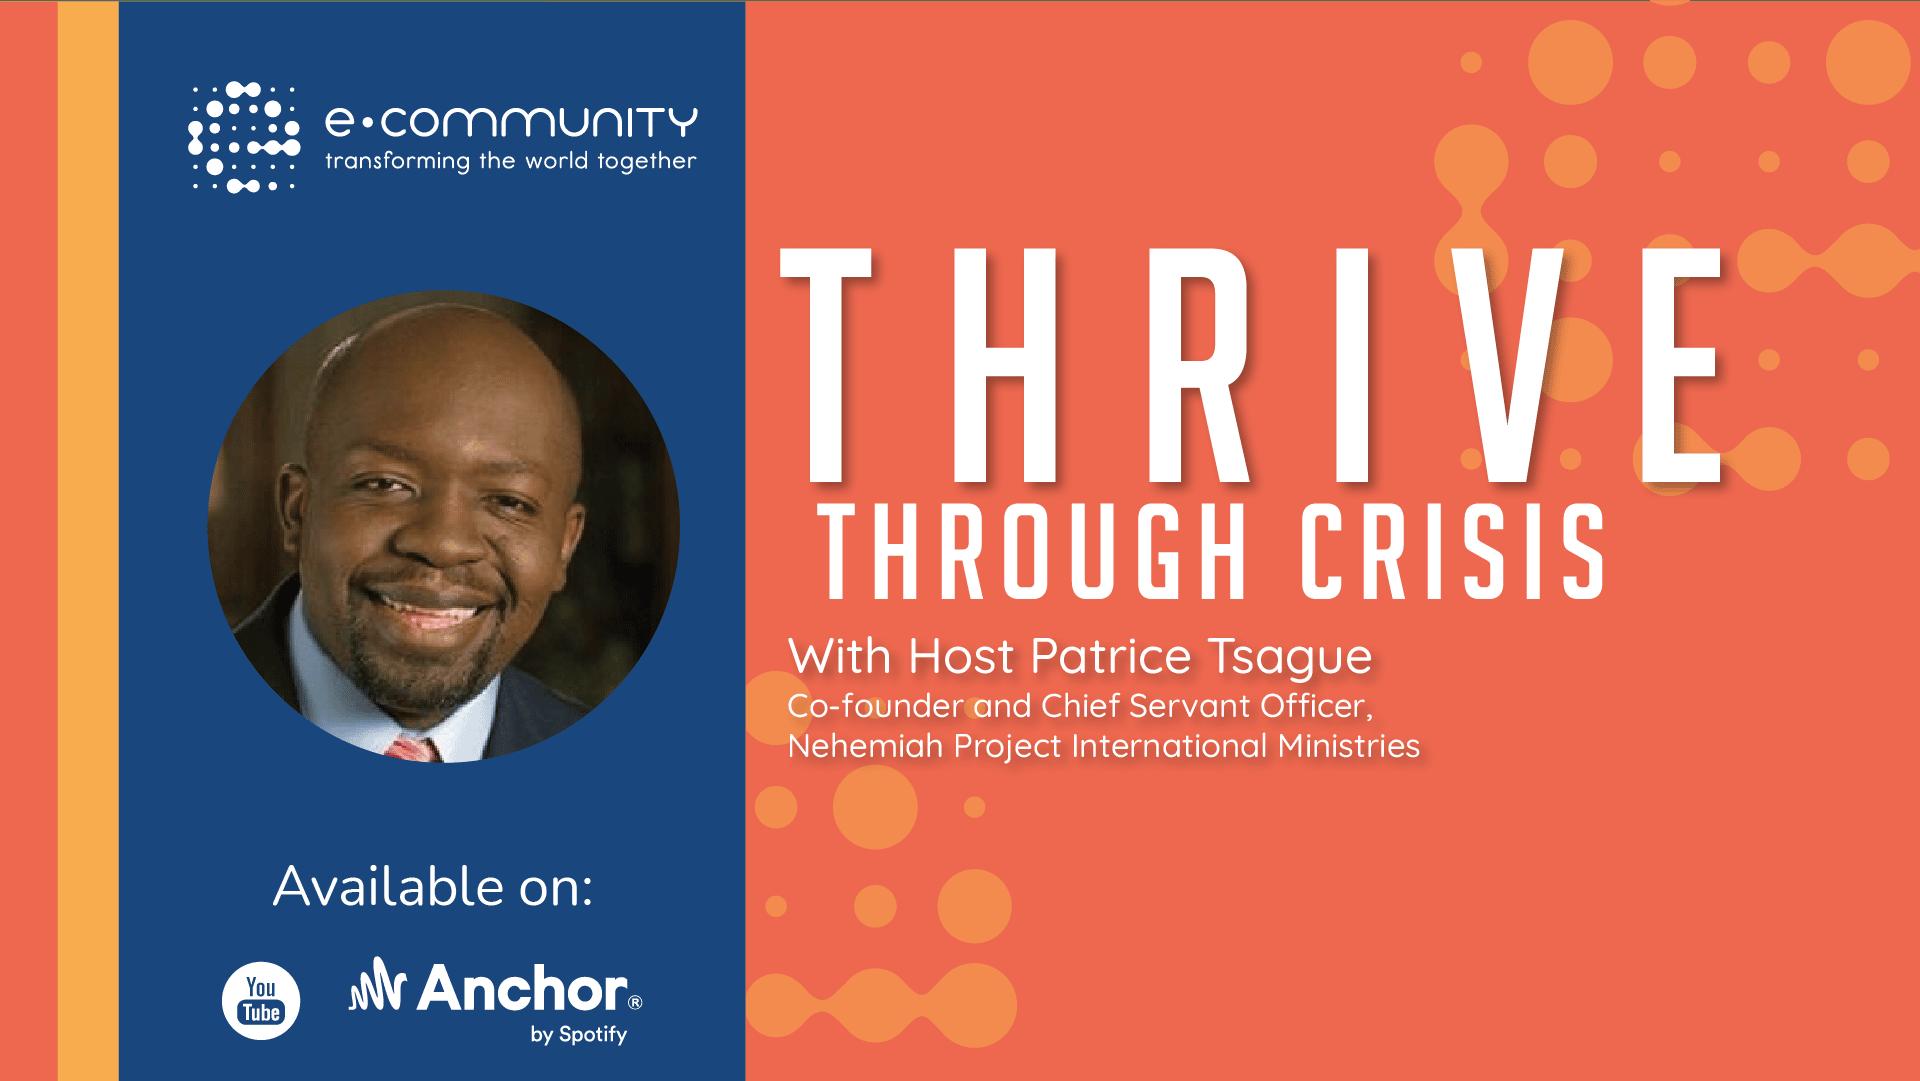 THRIVE Through Crisis